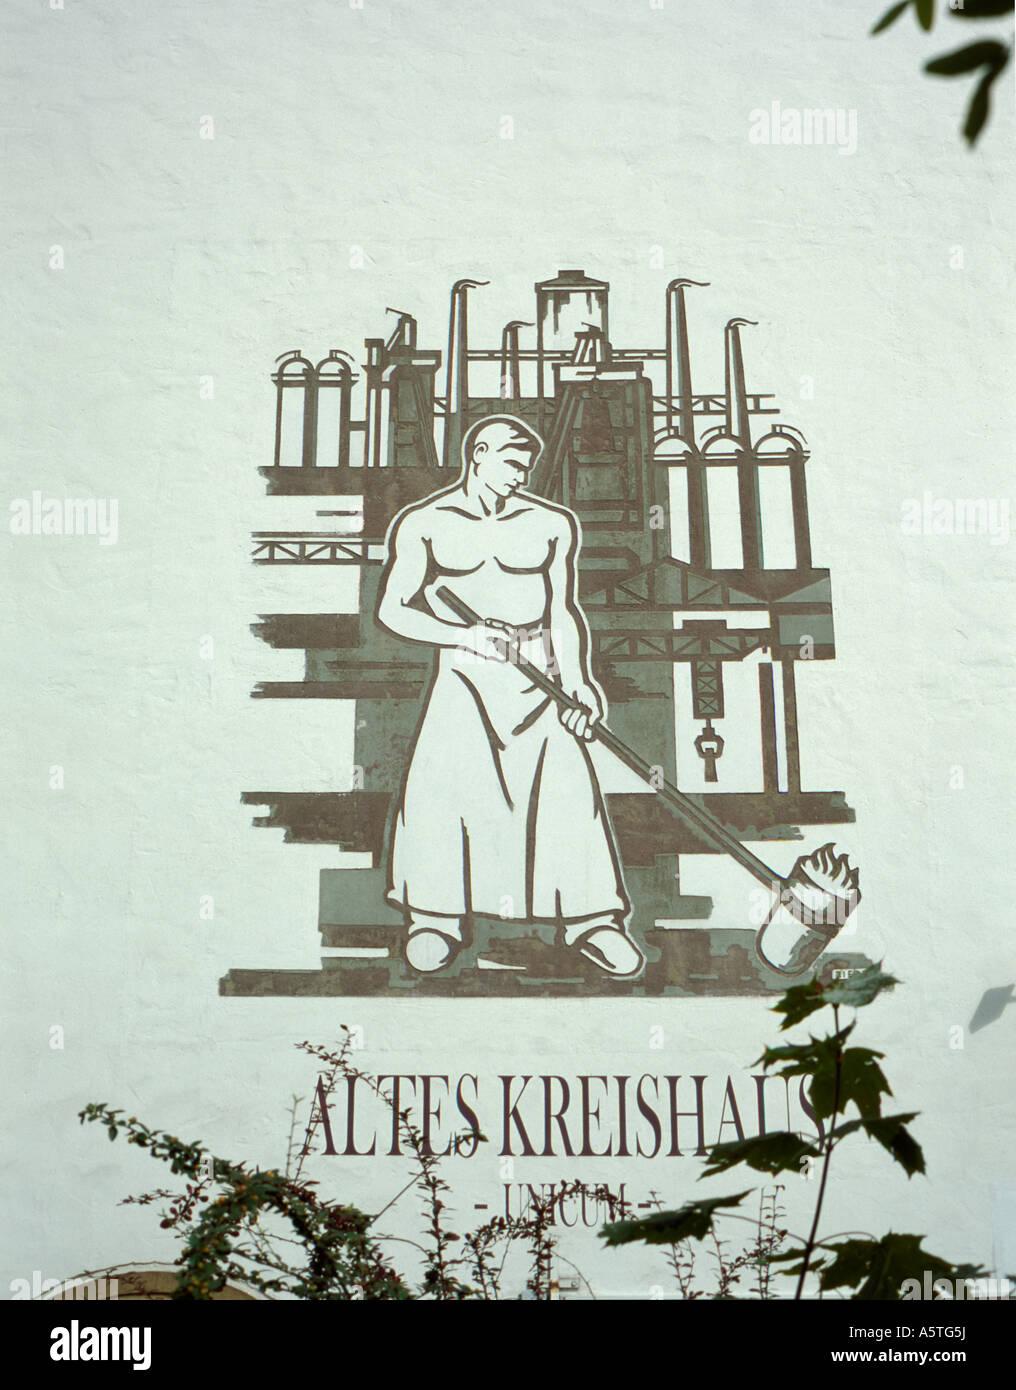 Gable end mural, Altes Kreishaus, Osnabrück, Neidersachsen (Lower Saxony), Germany. - Stock Image